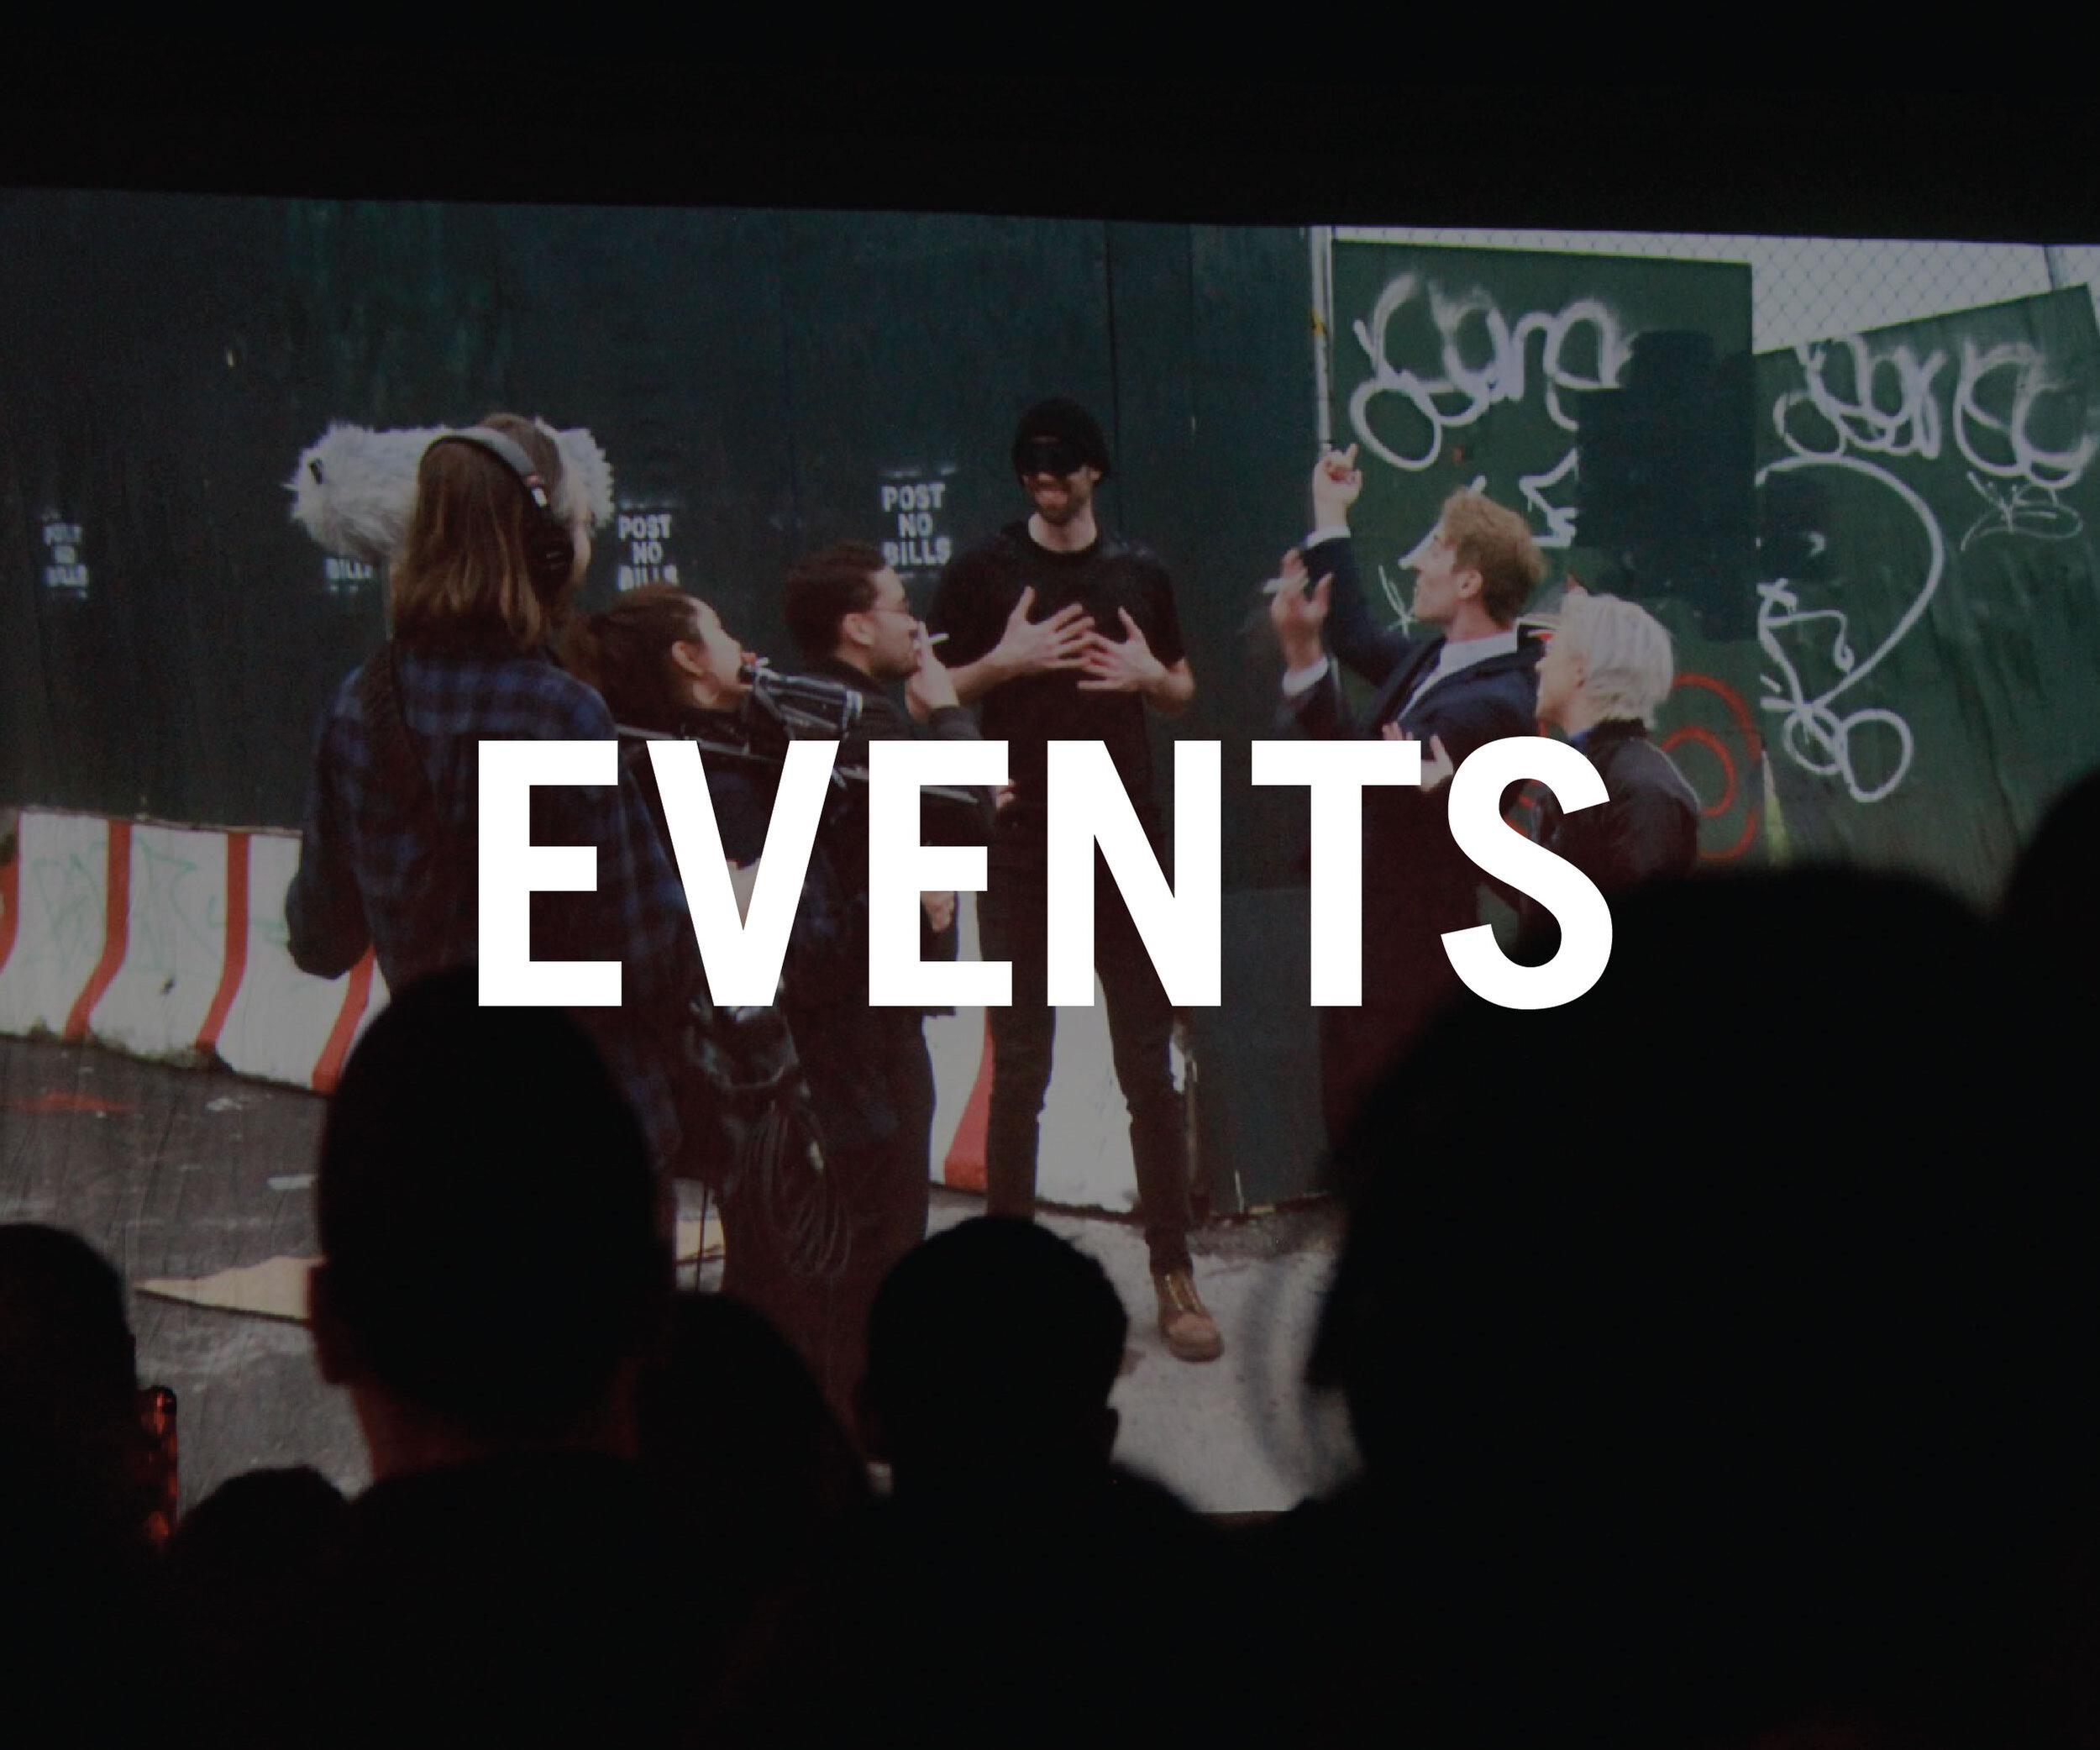 We host screenings to celebrate our members' work. Learn more here.